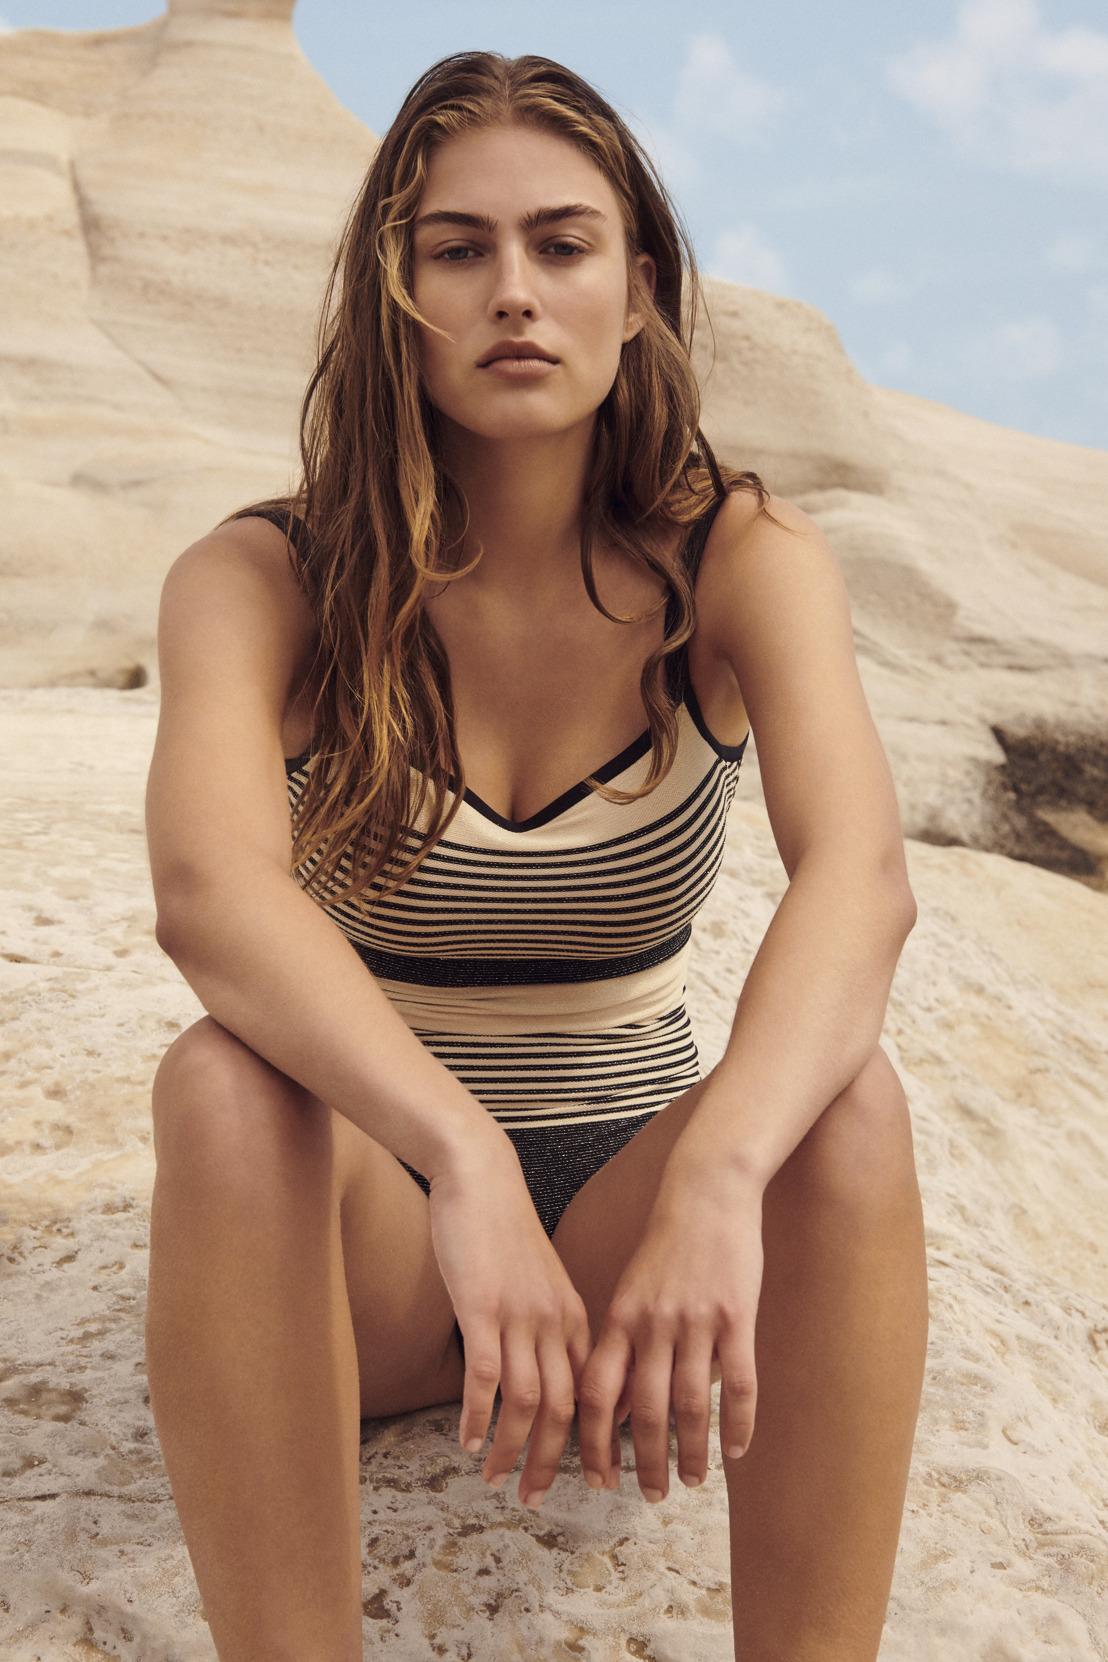 Marie Jo Swimwear Cruise-Kollektion: Luxuriöse Silhouetten, mit Anklängen an Seventies-Chic